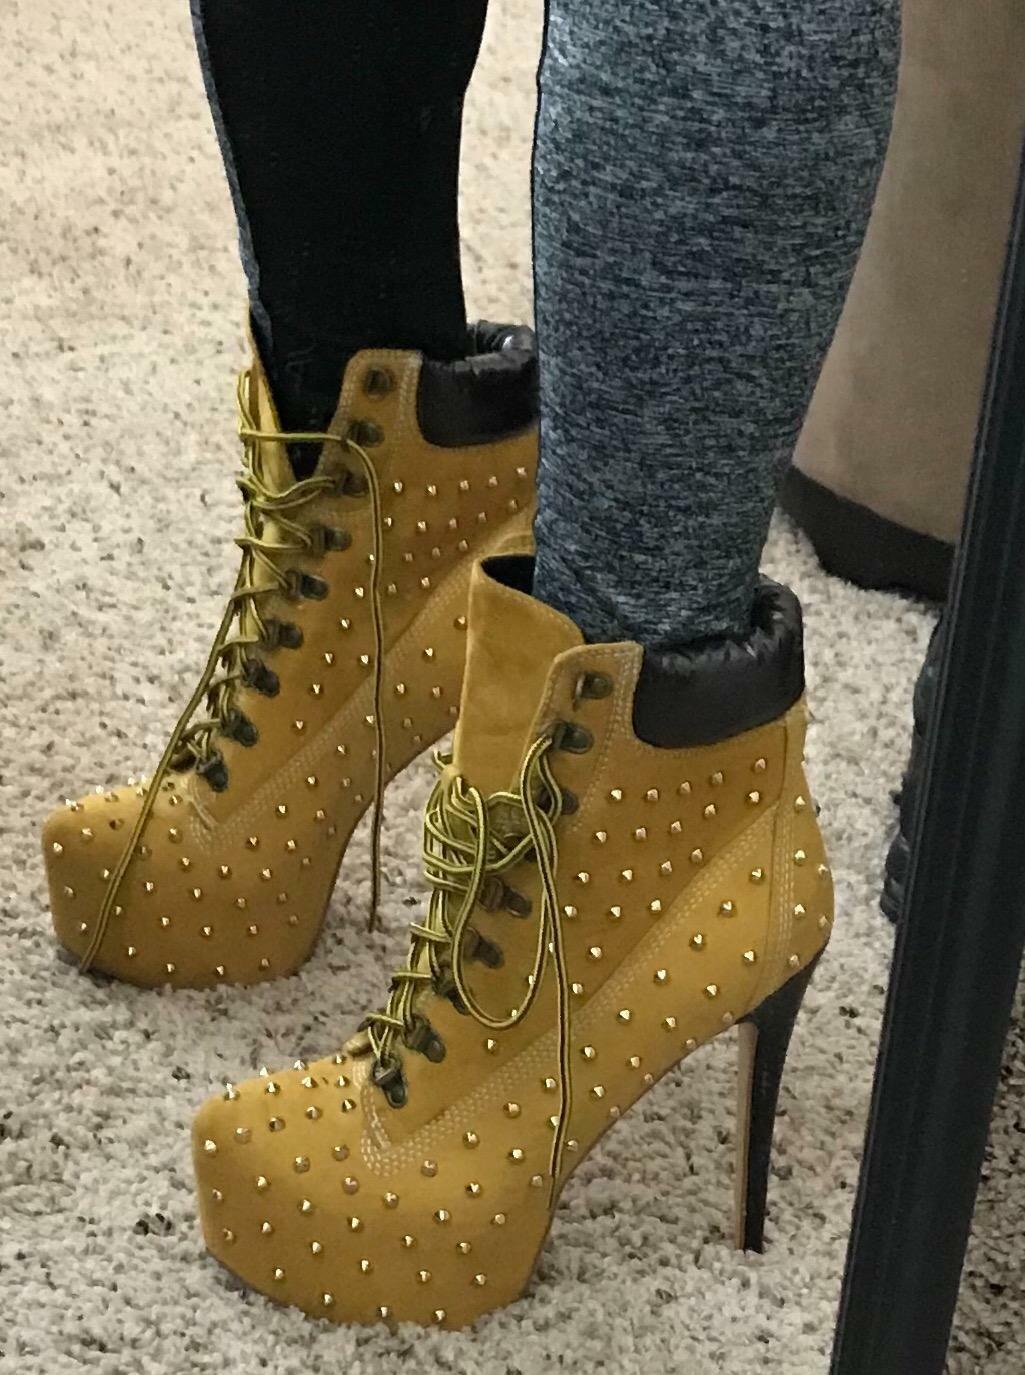 Onlymaker Women High Heel Rivet Studded Platform Pointed Toe Lace Up Ankle Boots